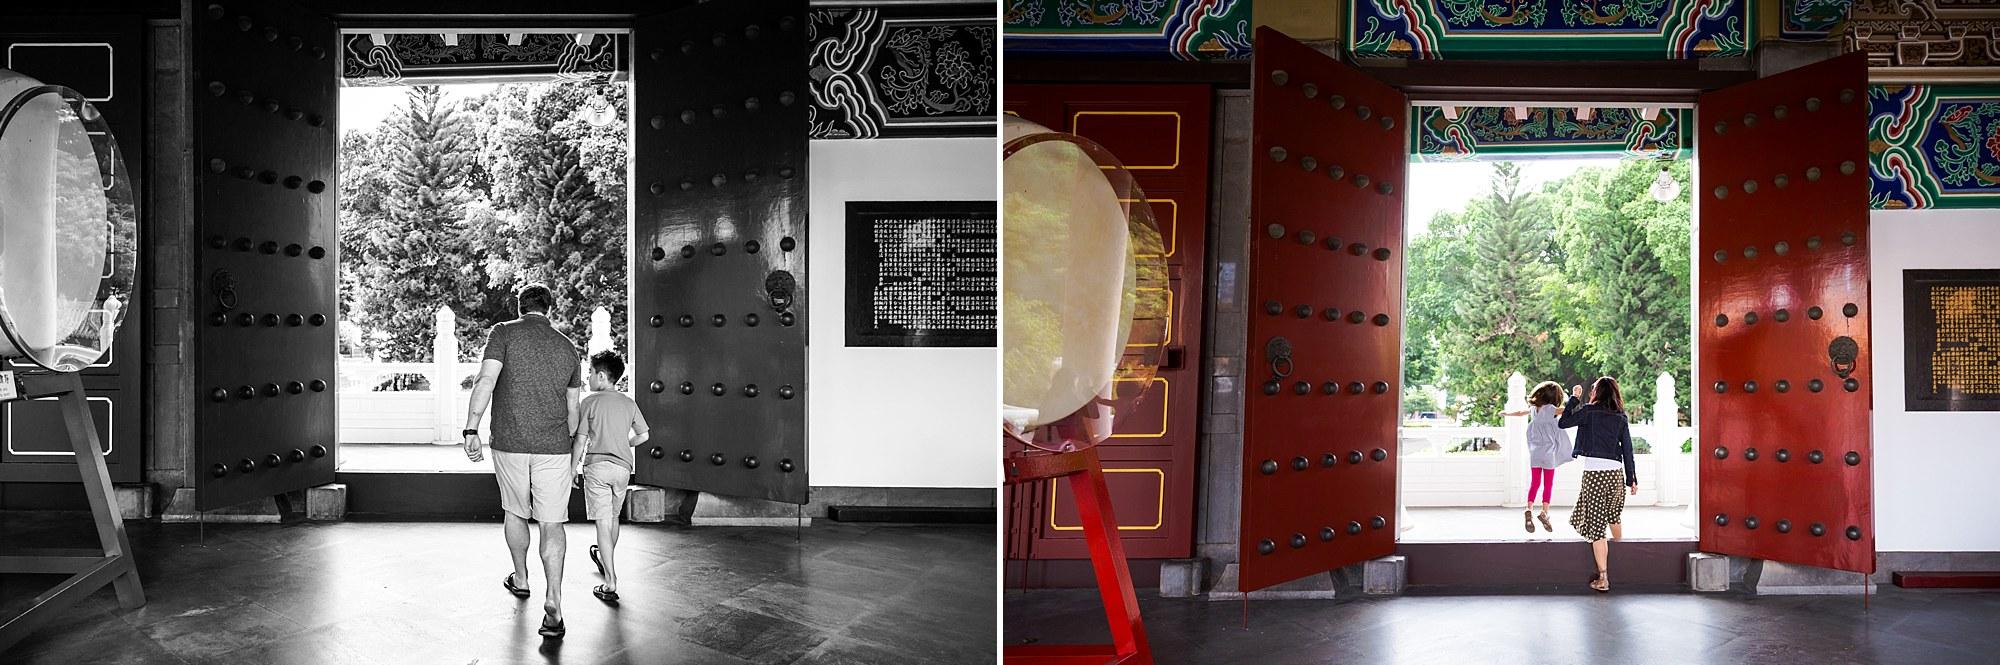 Taichung_Family_Photos_Hunnicutt_Photography_0036